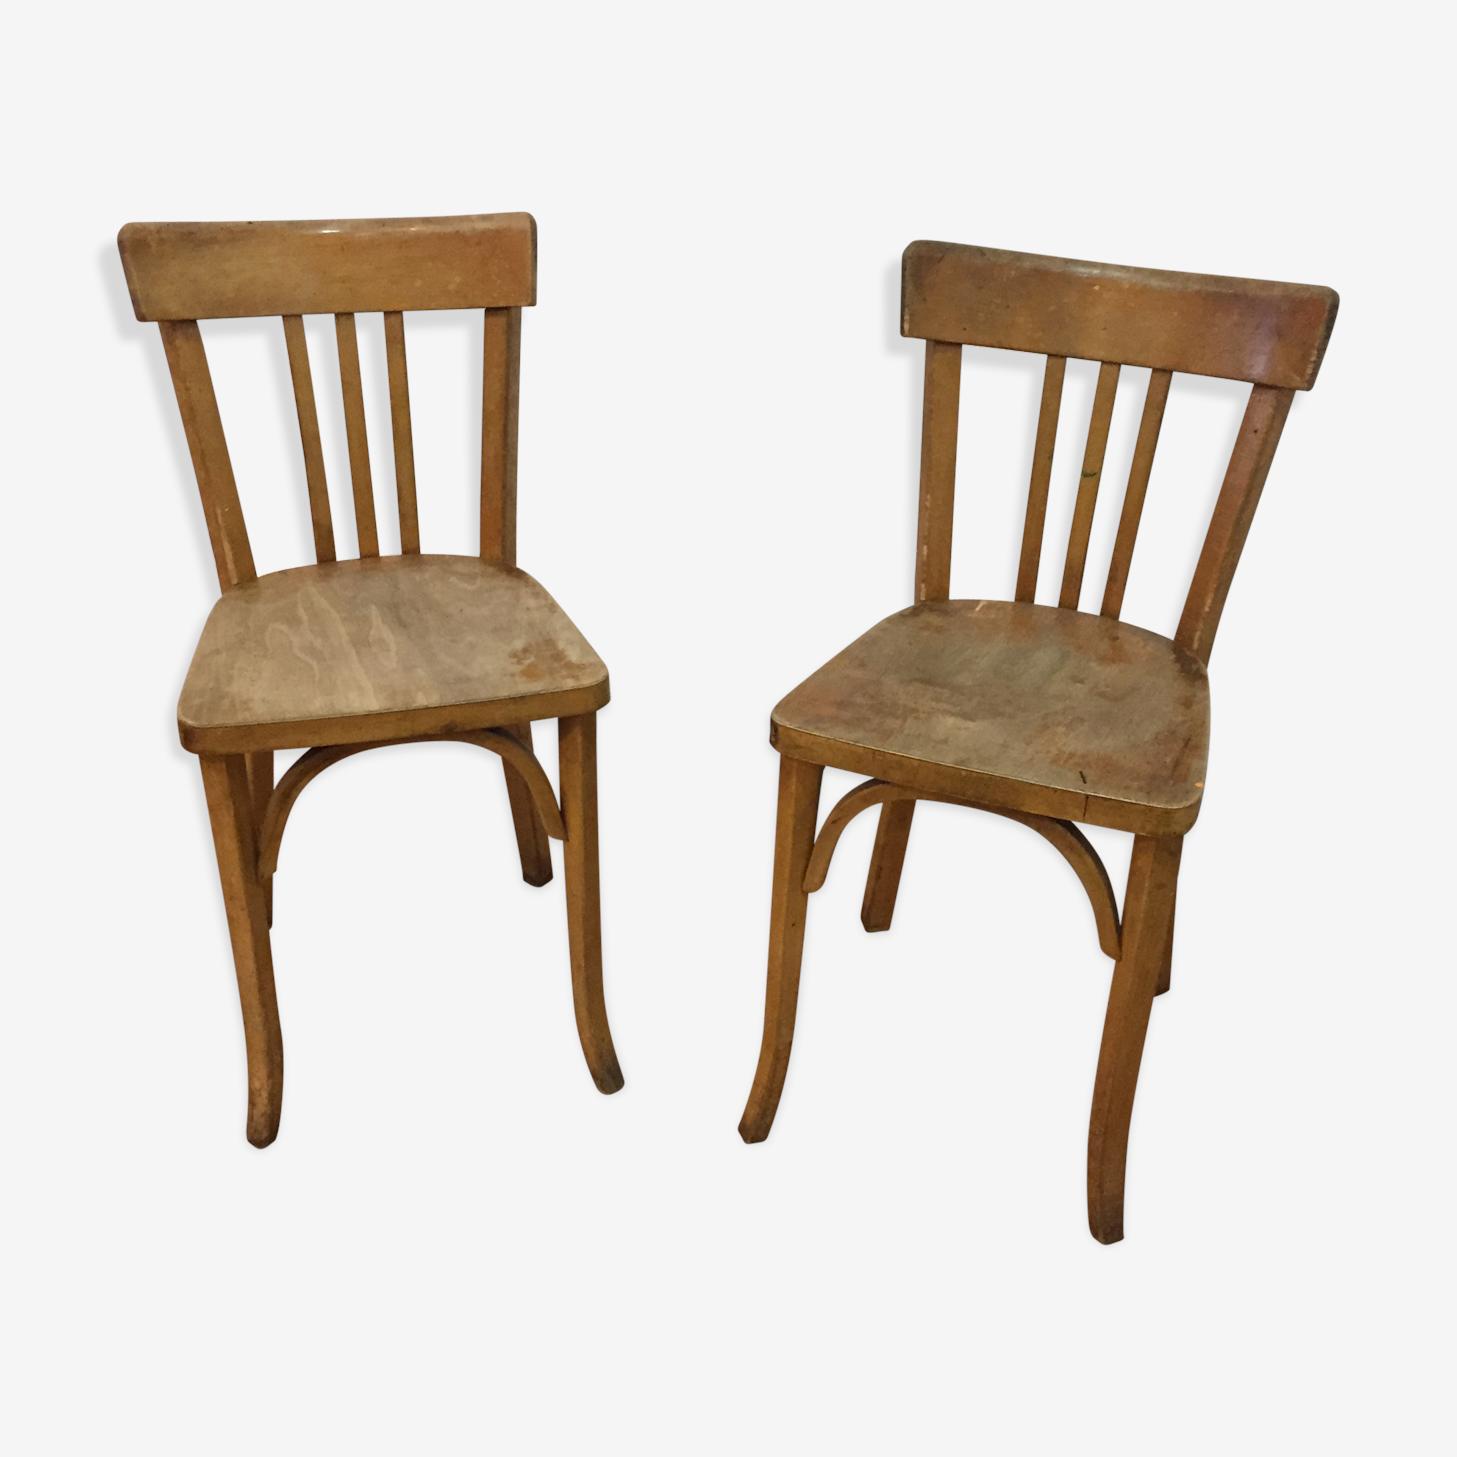 Set of two chairs Baumann